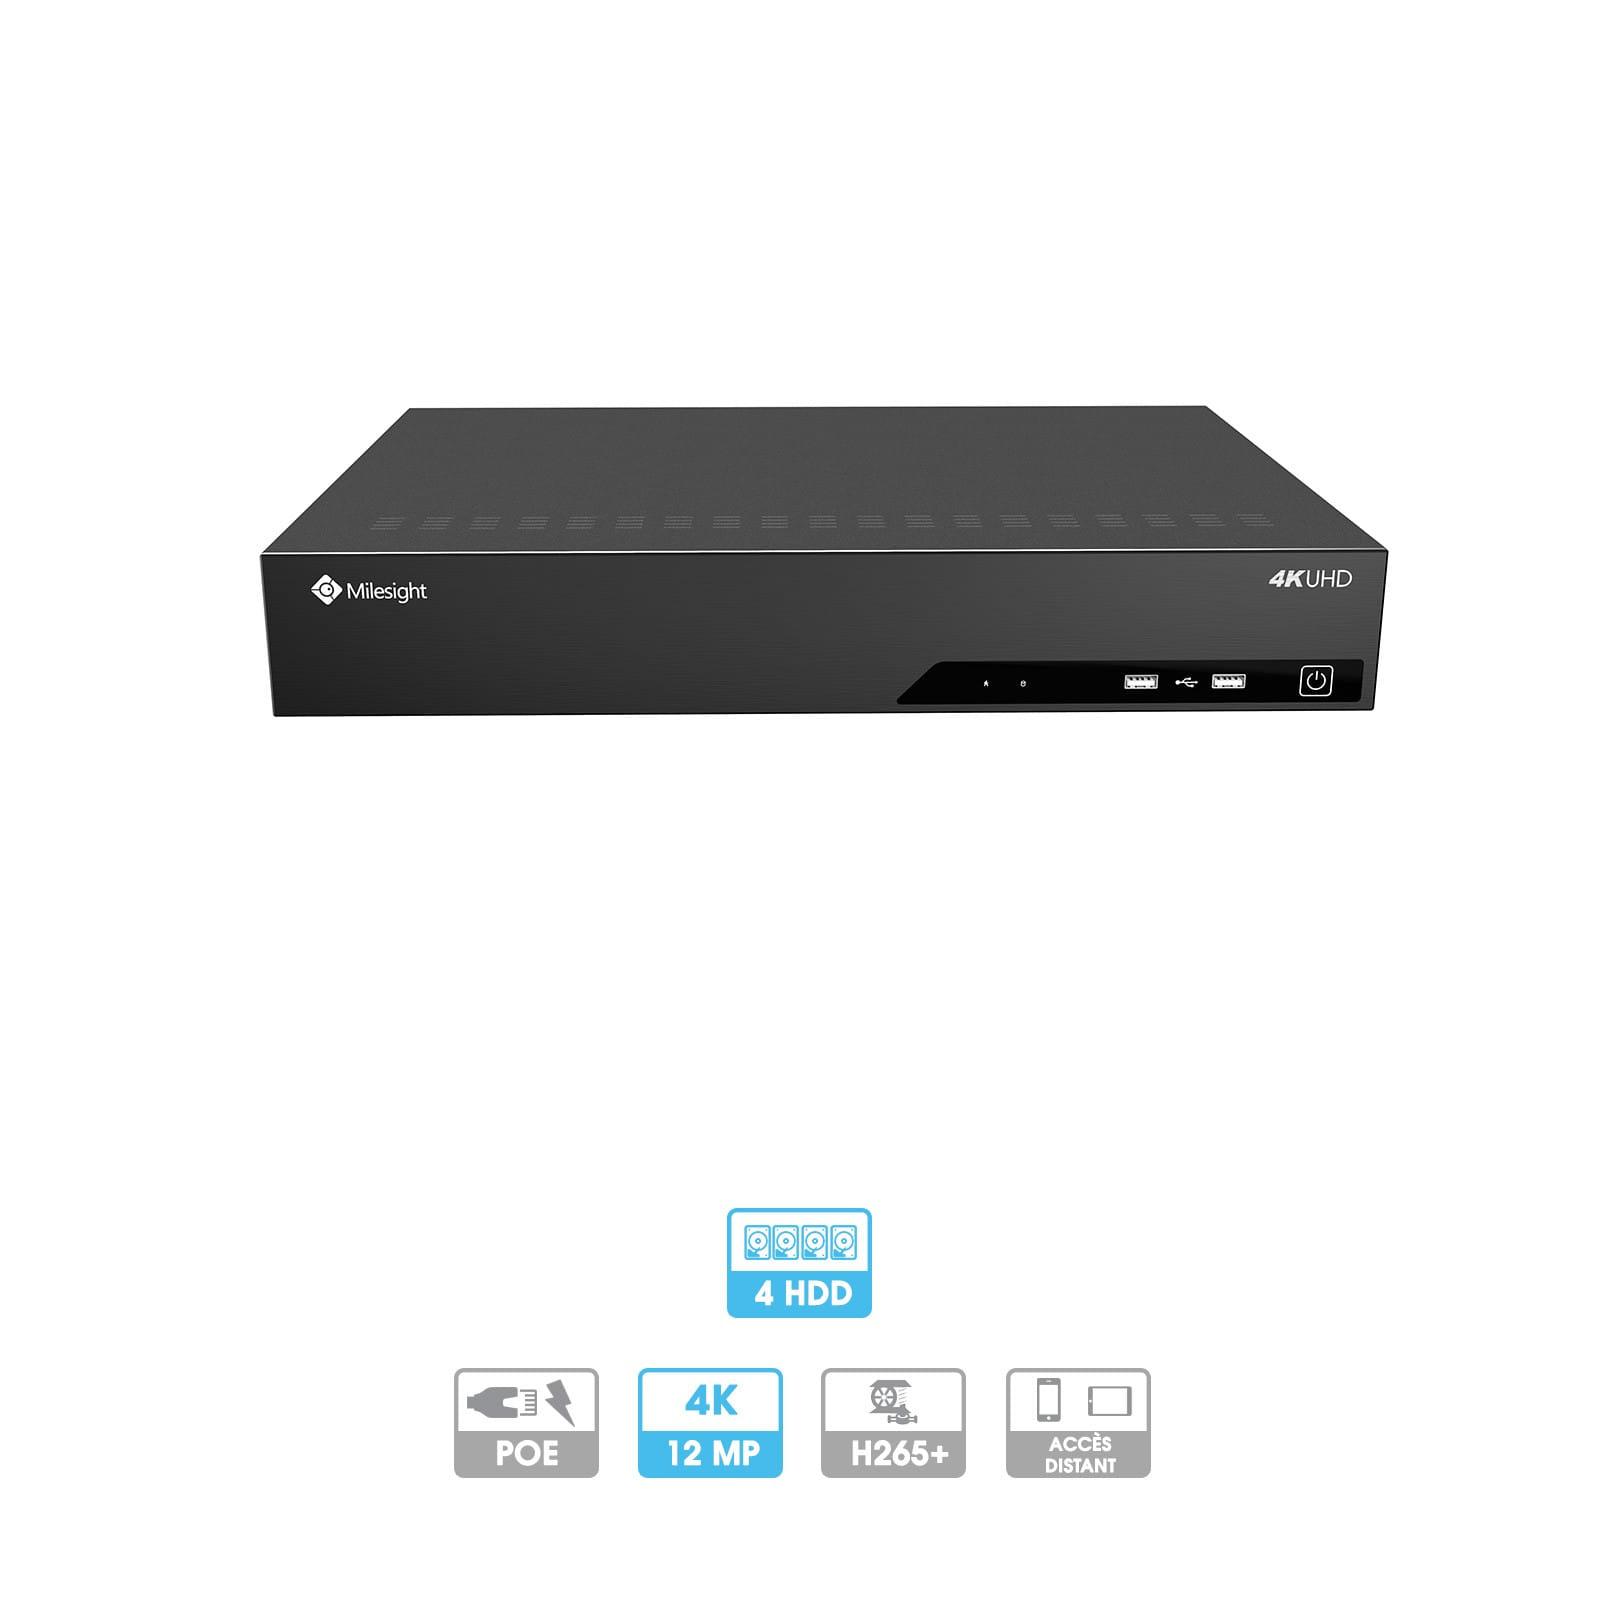 Enregistreur NVR Milesight   16 caméras (16 PoE)   IP   PoE   12 MP   2 HDD